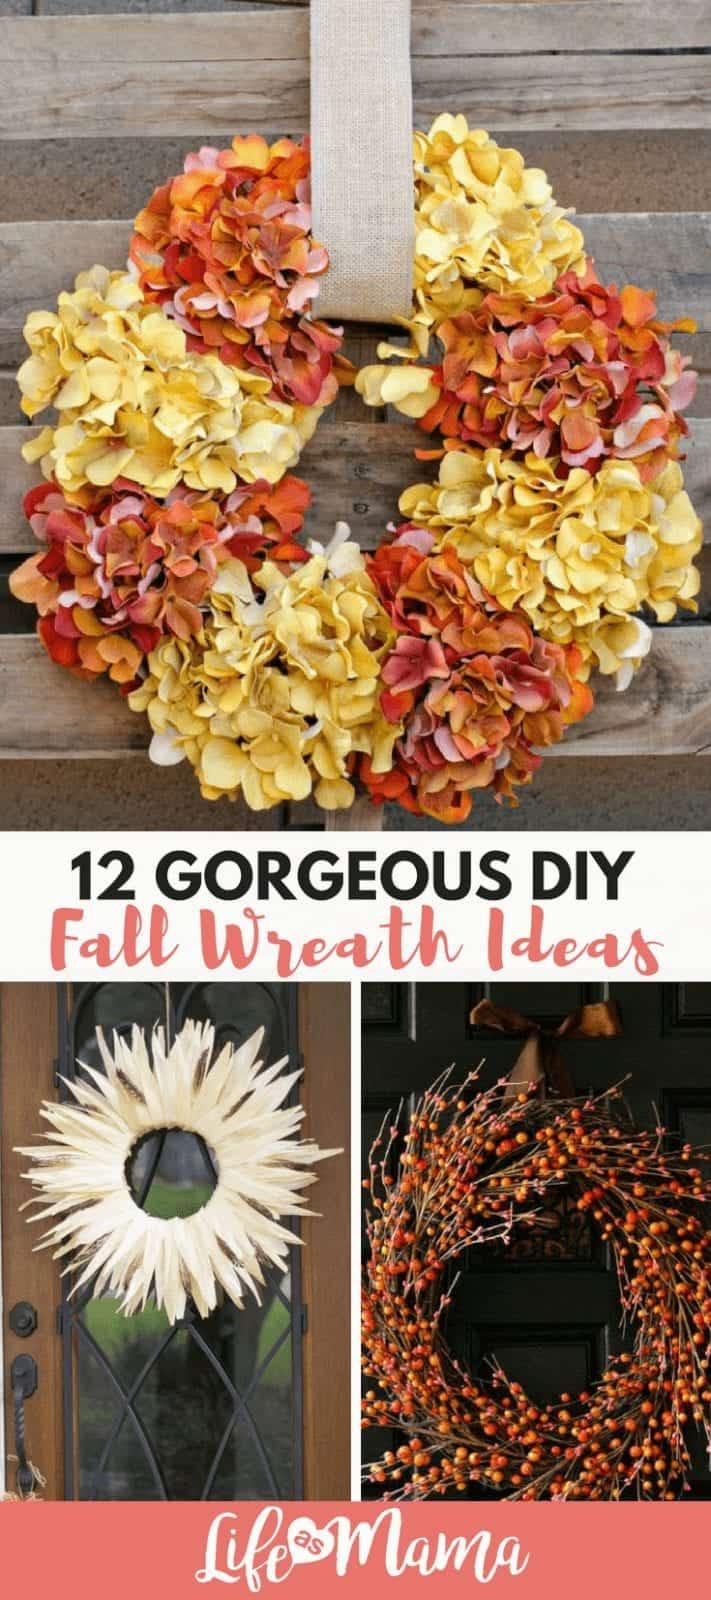 12 Gorgeous DIY Fall Wreath Ideas